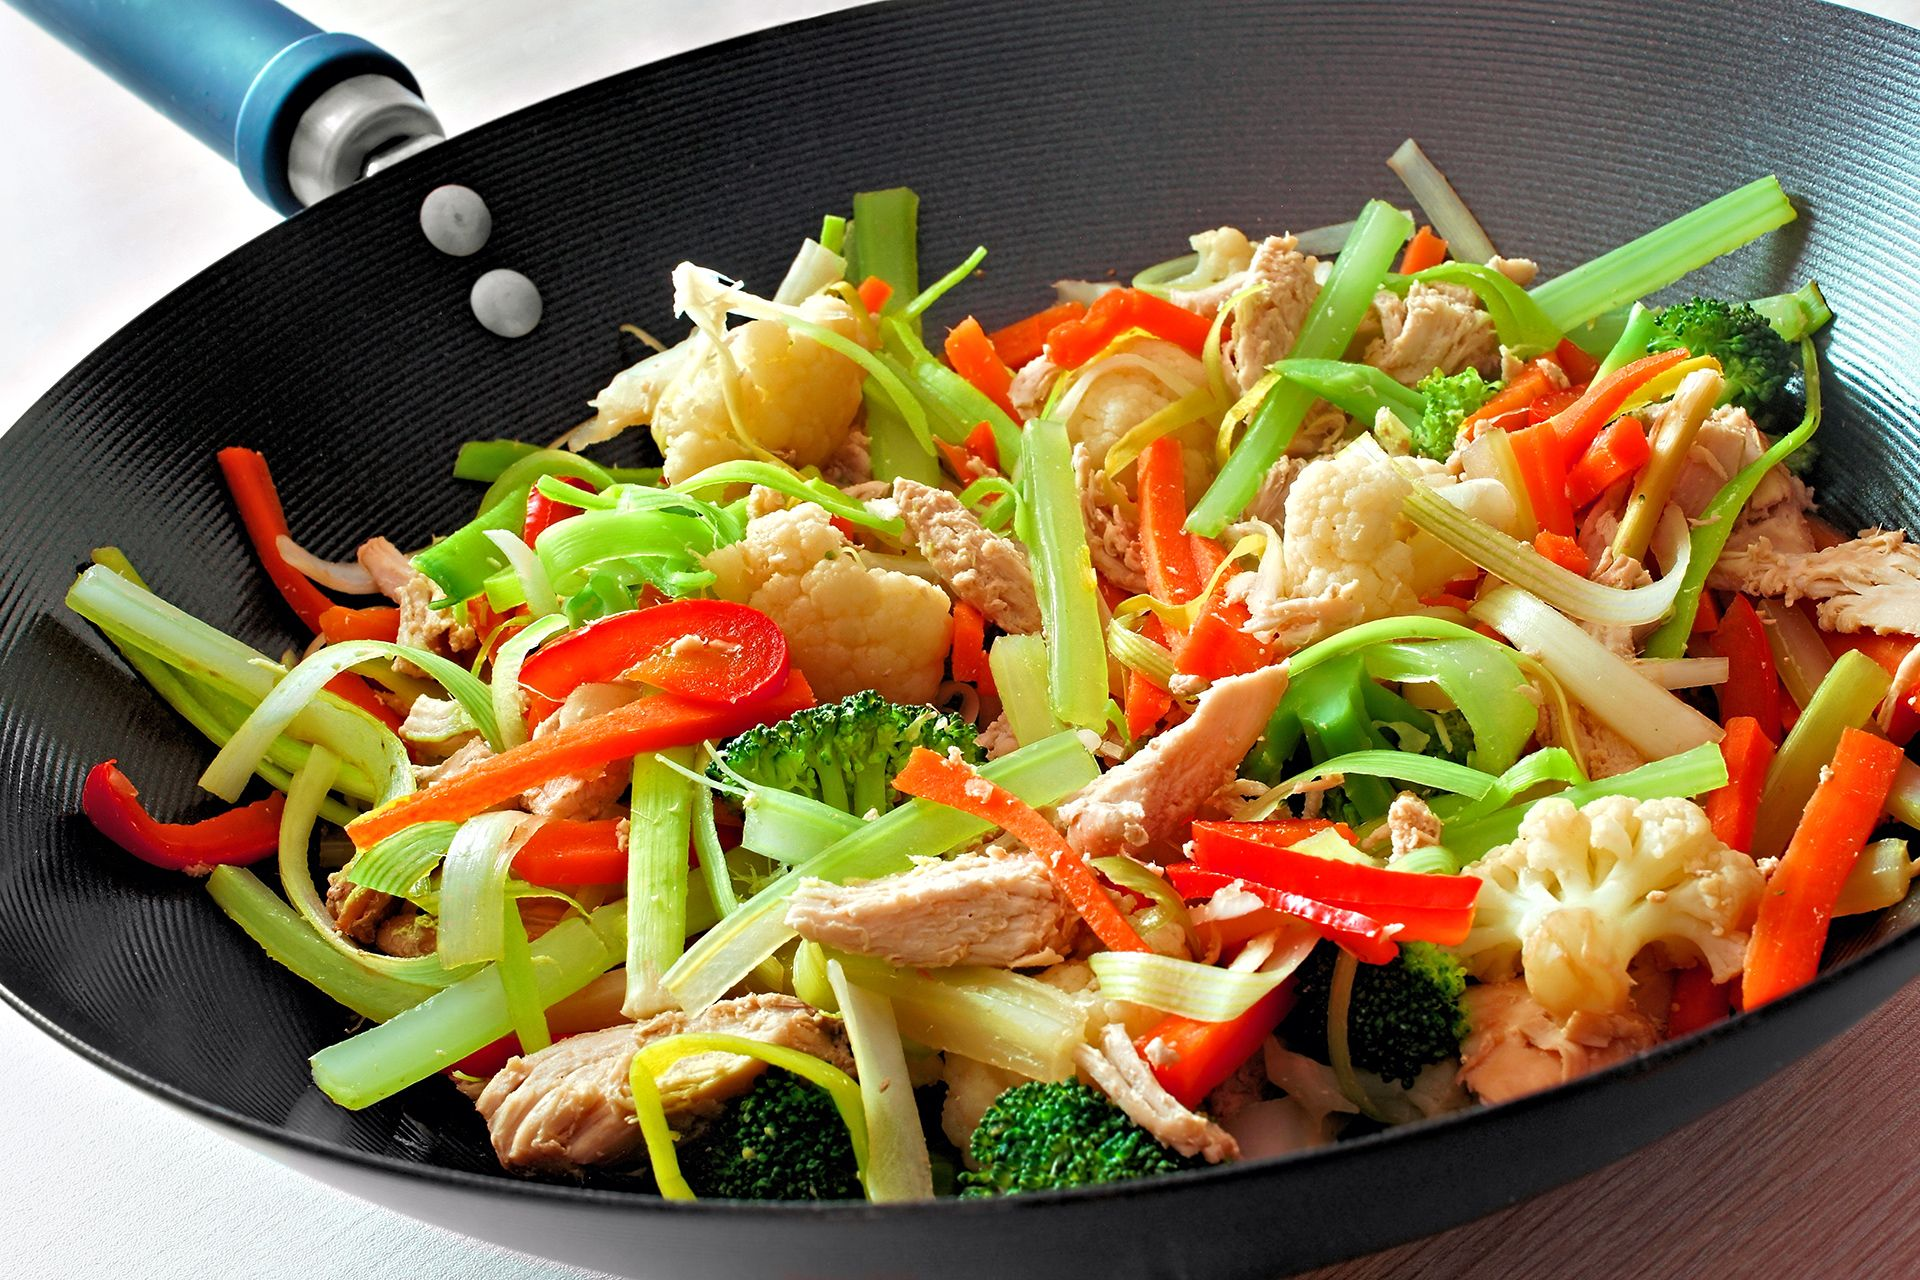 Asiatische Küche | Catering Asiatische Kuche